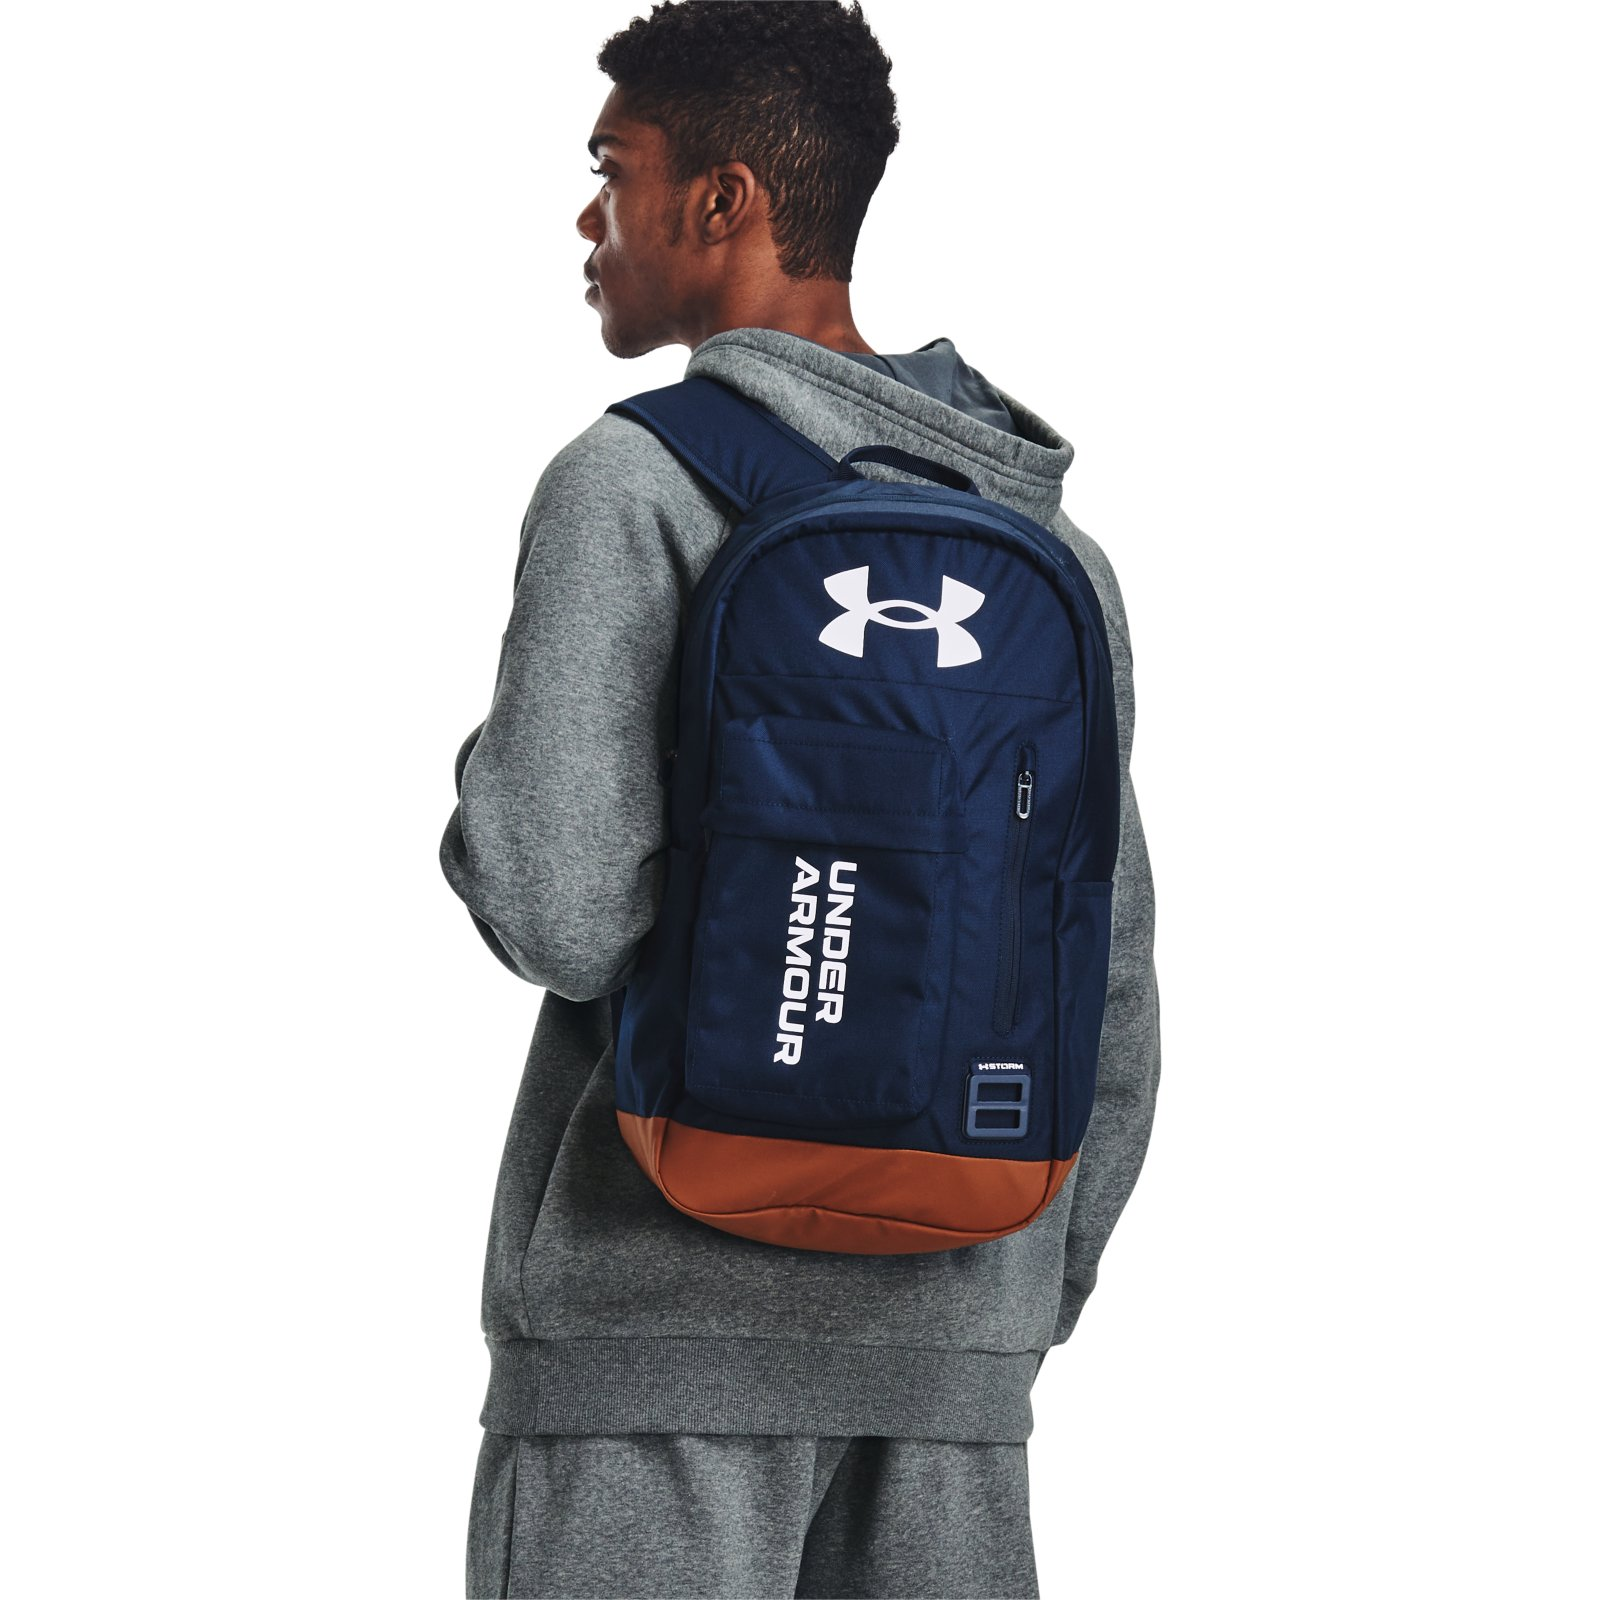 Рюкзак унисекс Under Armour Halftime Backpack синий